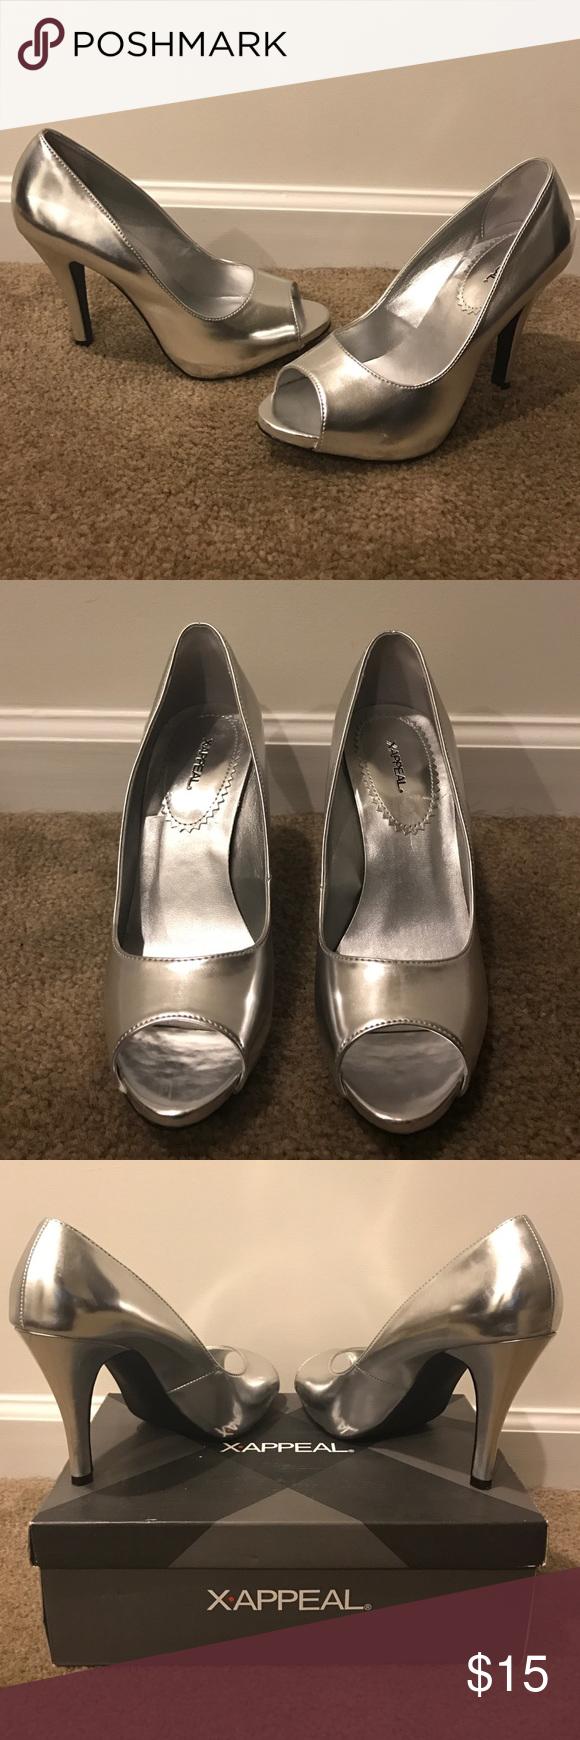 Silver peep-toe heels Cute flashy heels. Definitely an eye-catcher. Only worn a few times. Comes with original box. x appeal Shoes Heels